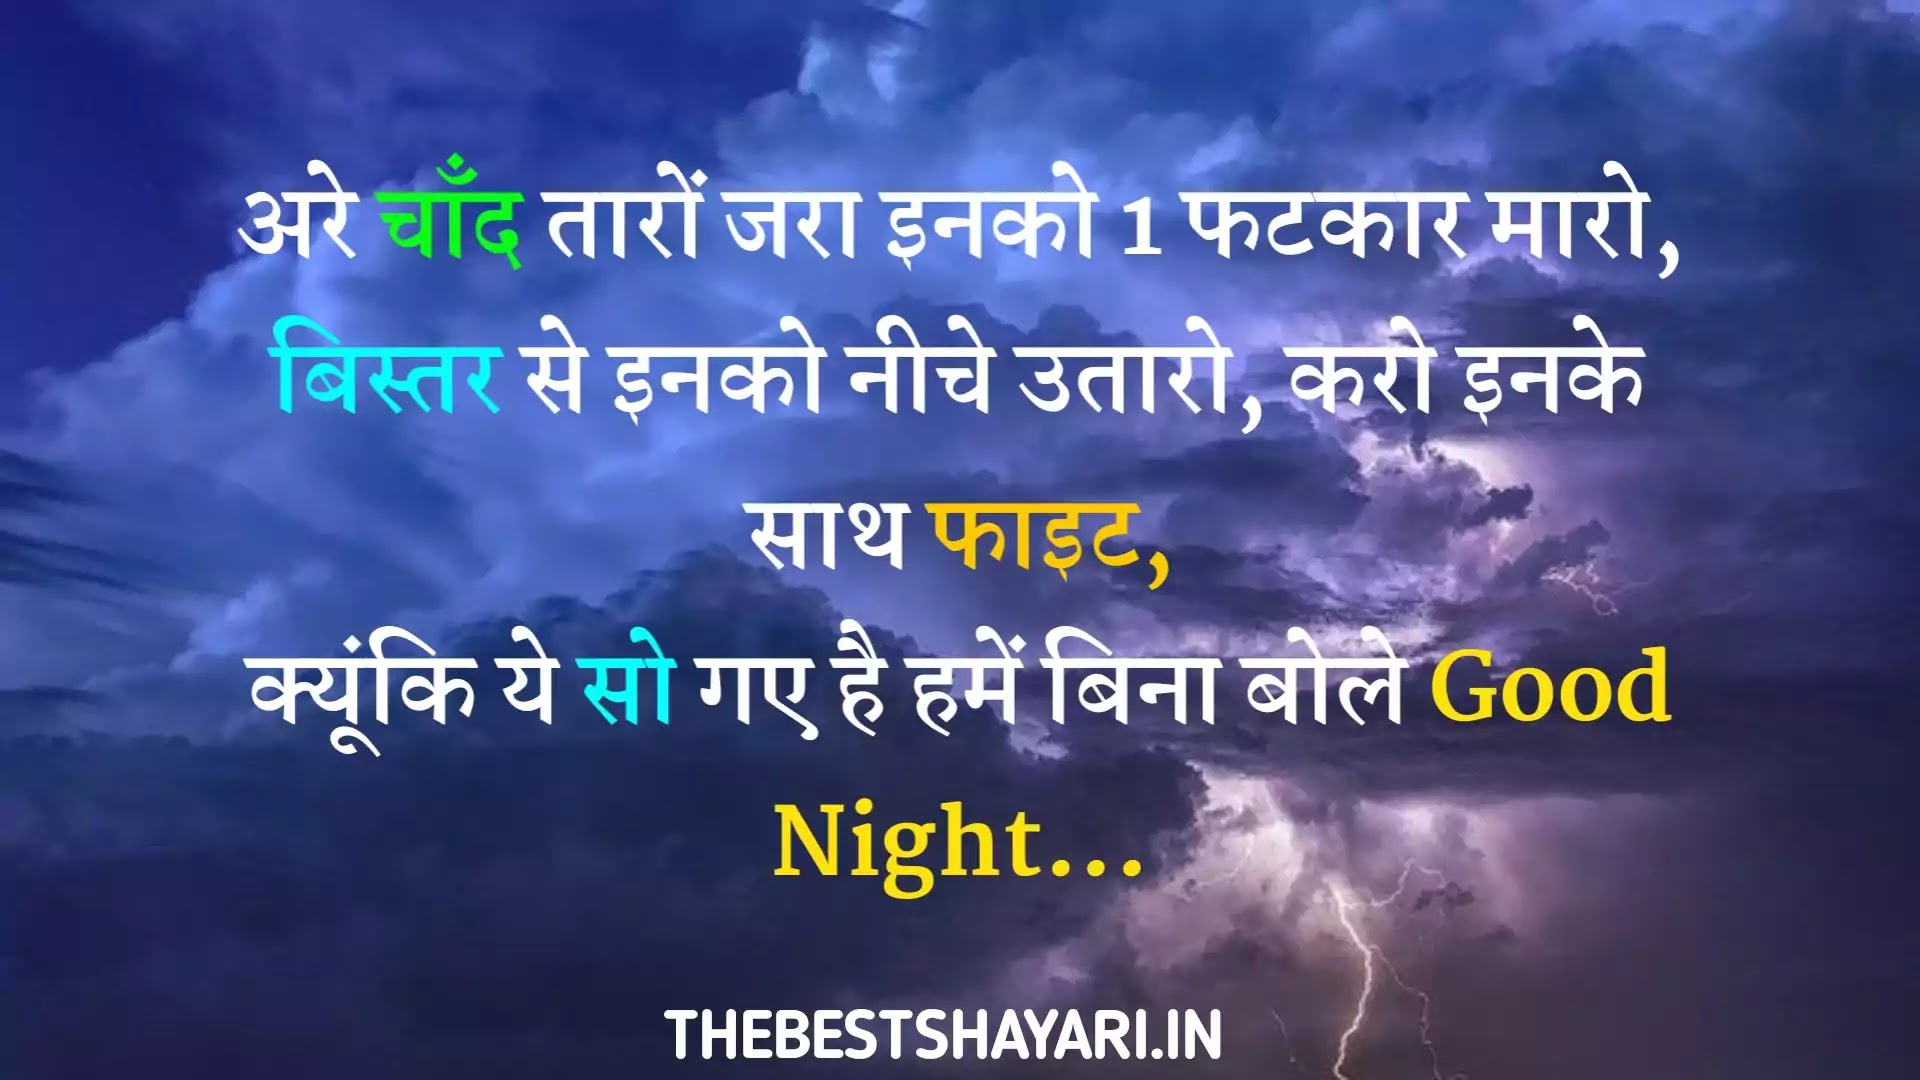 Funny good night message